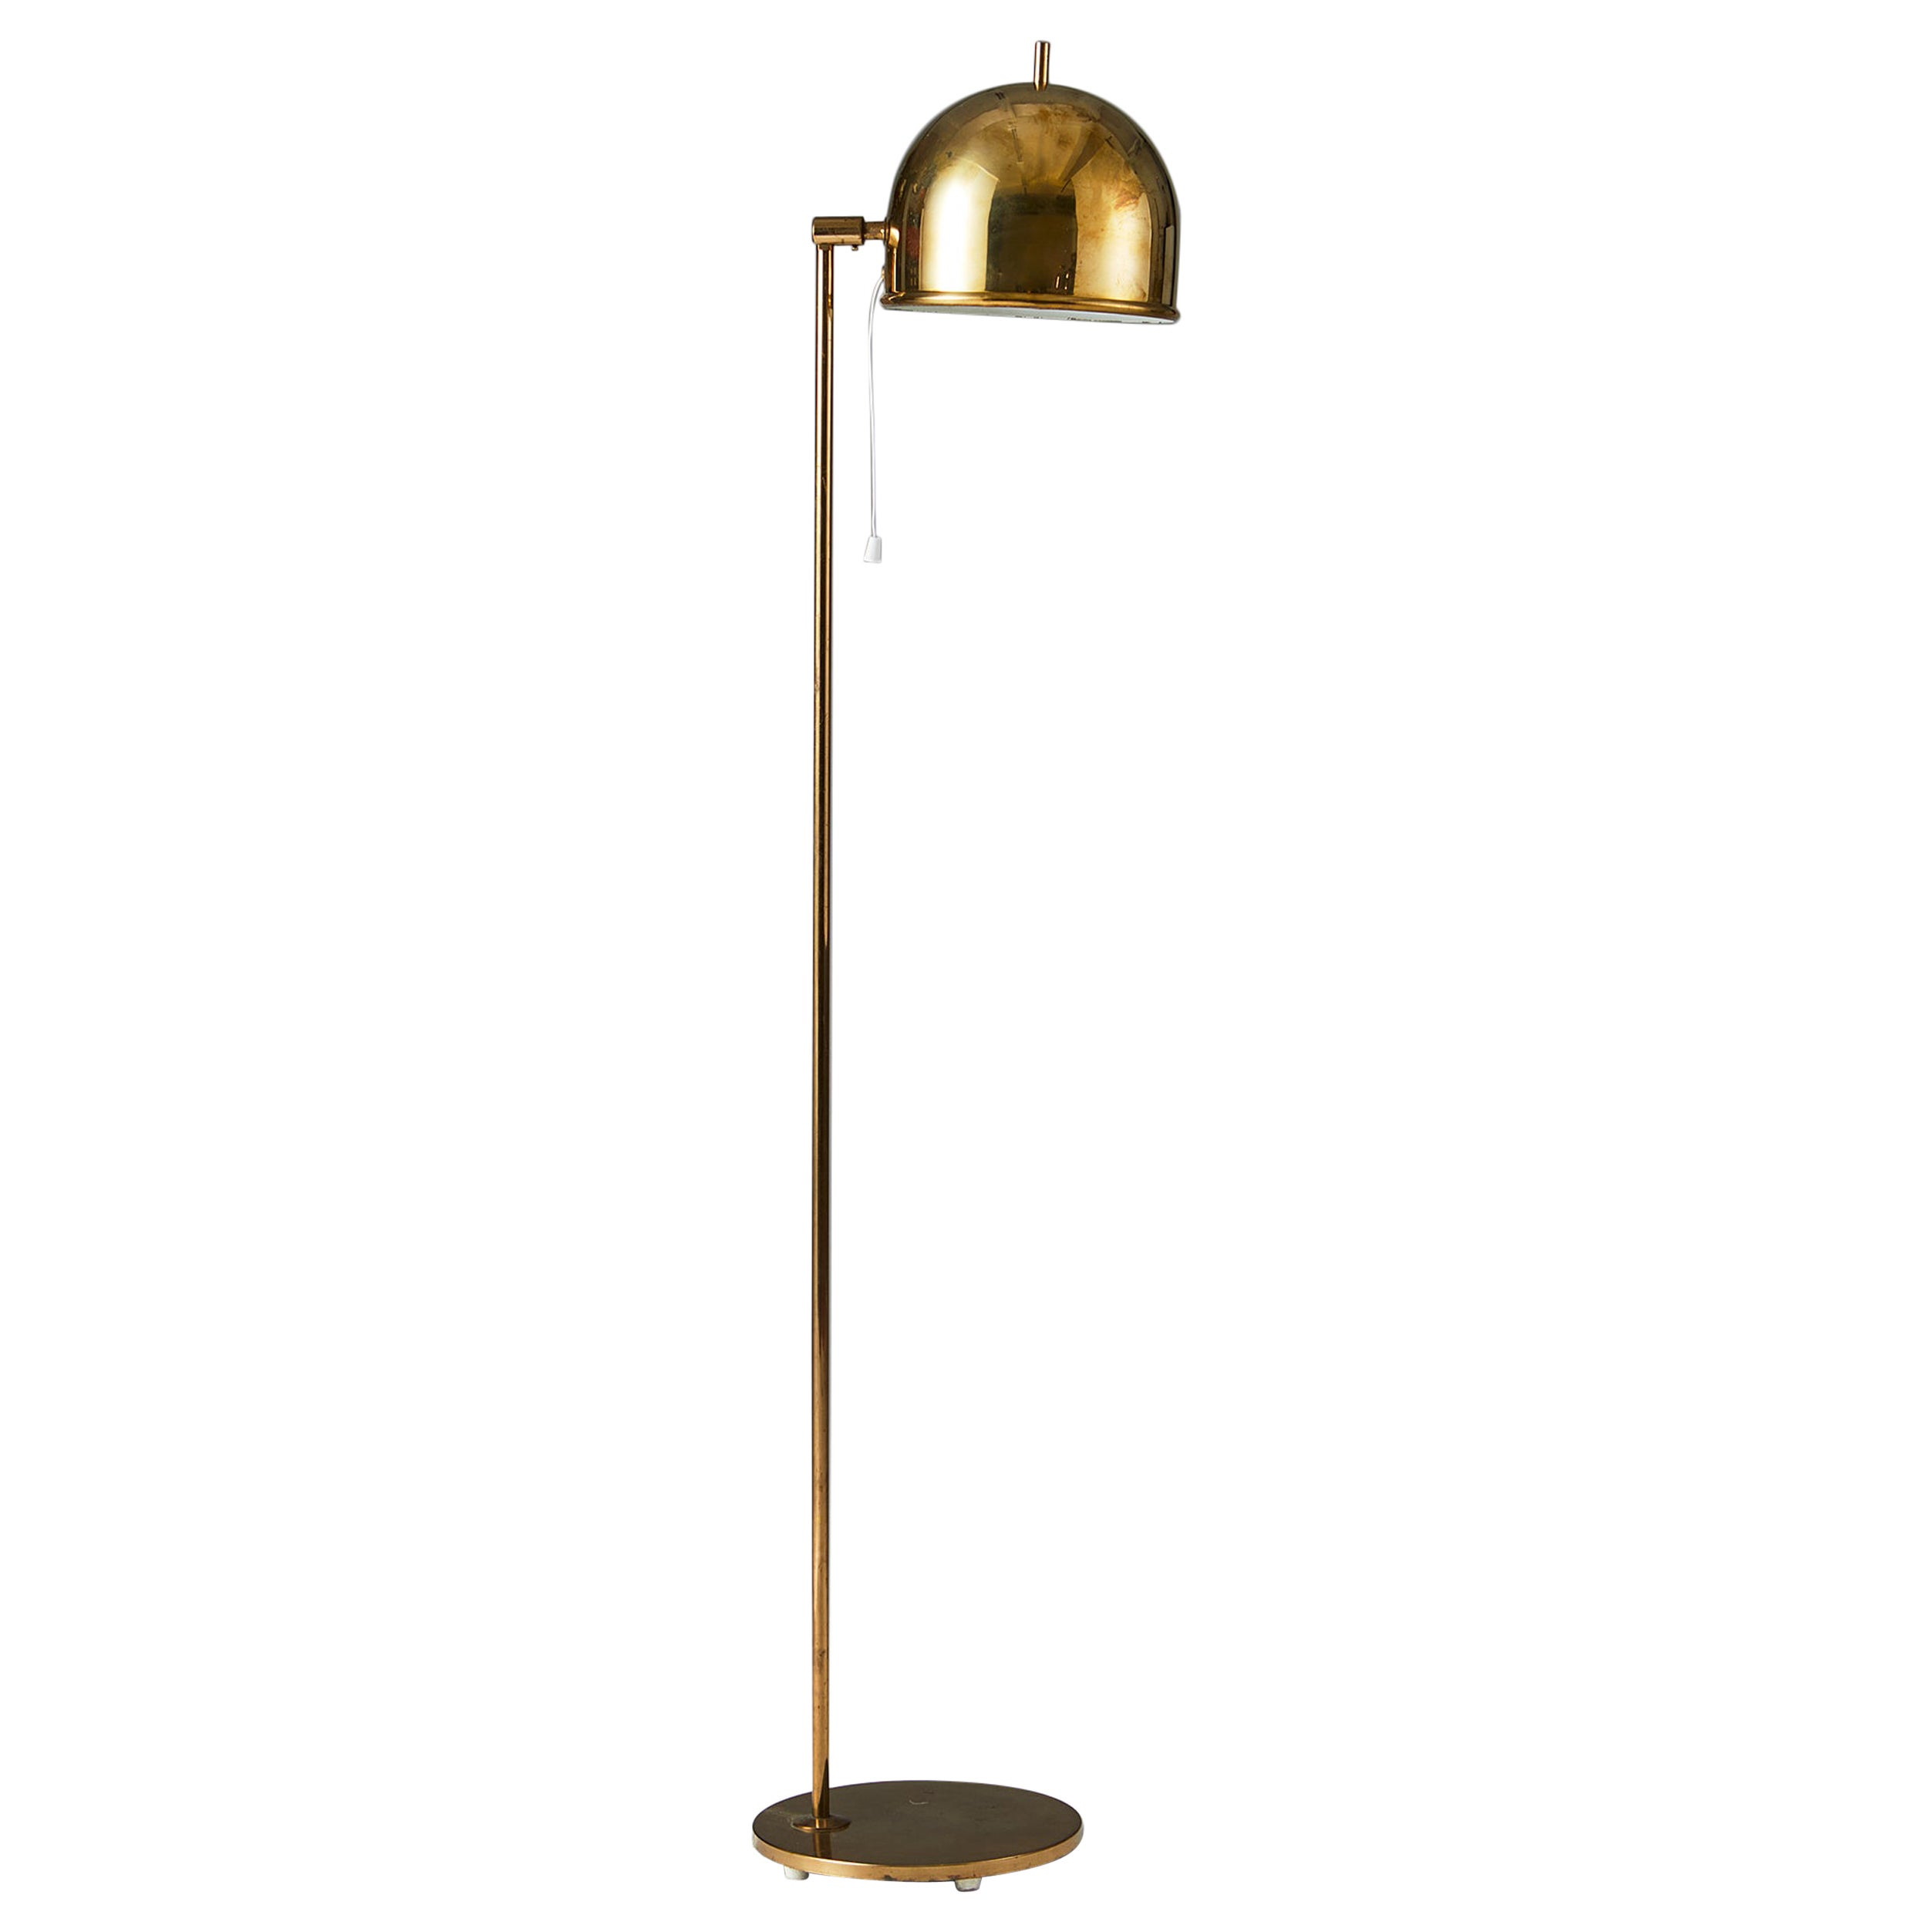 Floor Lamp, Anonymous, for Bergboms, Sweden, 1960s